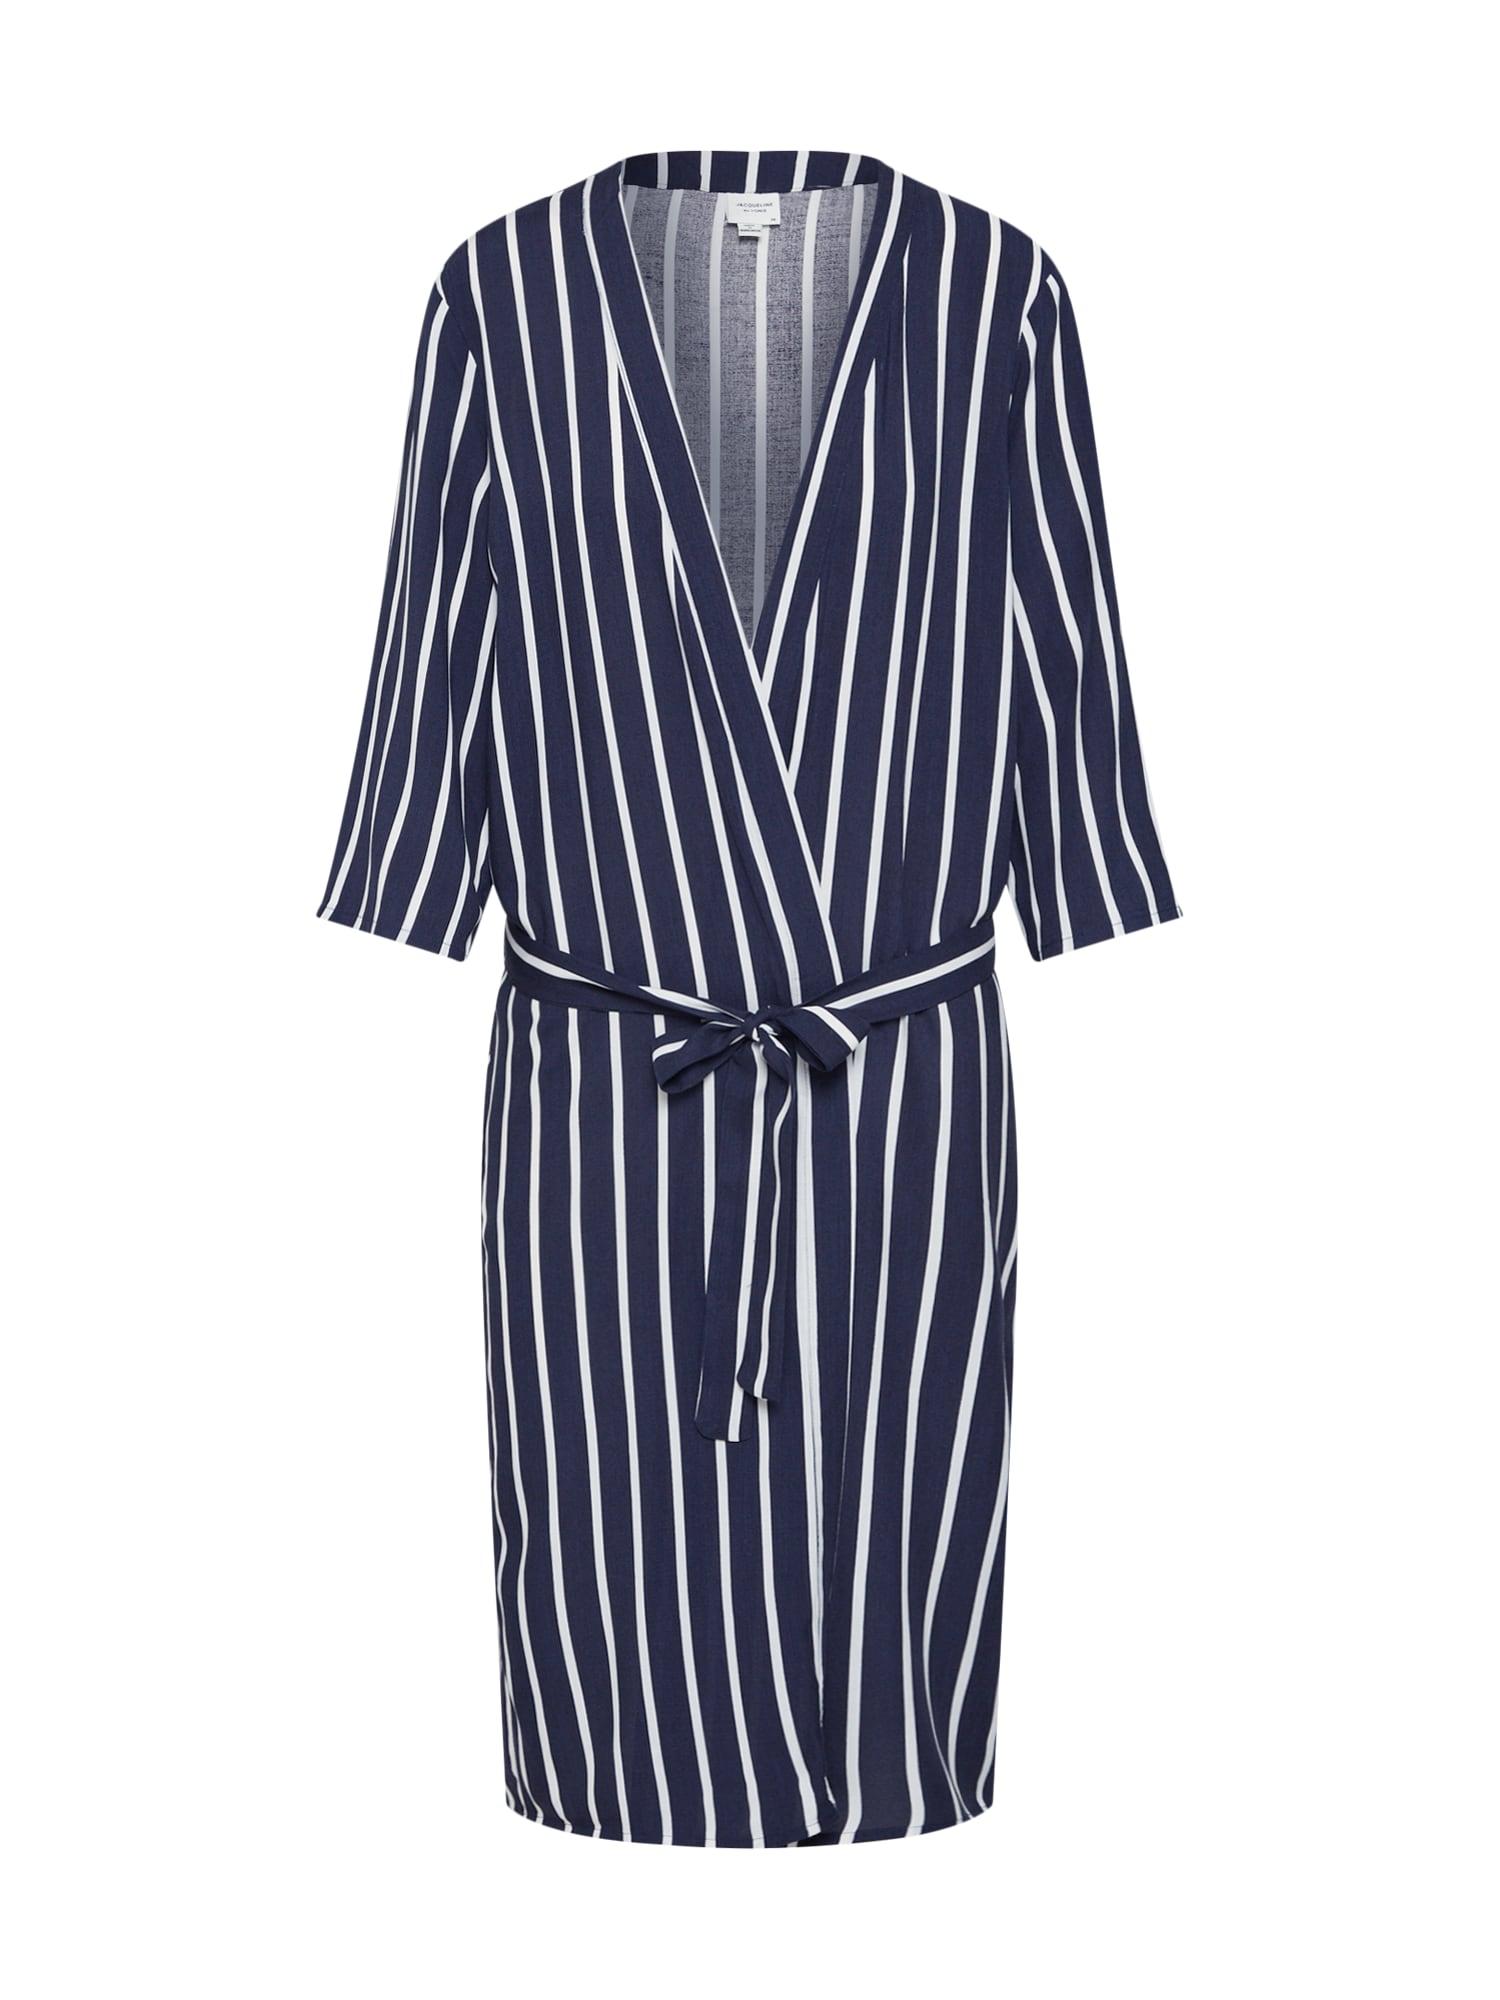 Kimono JDYSTAR 34 KIMONO WVN FS námořnická modř bílá JACQUELINE De YONG